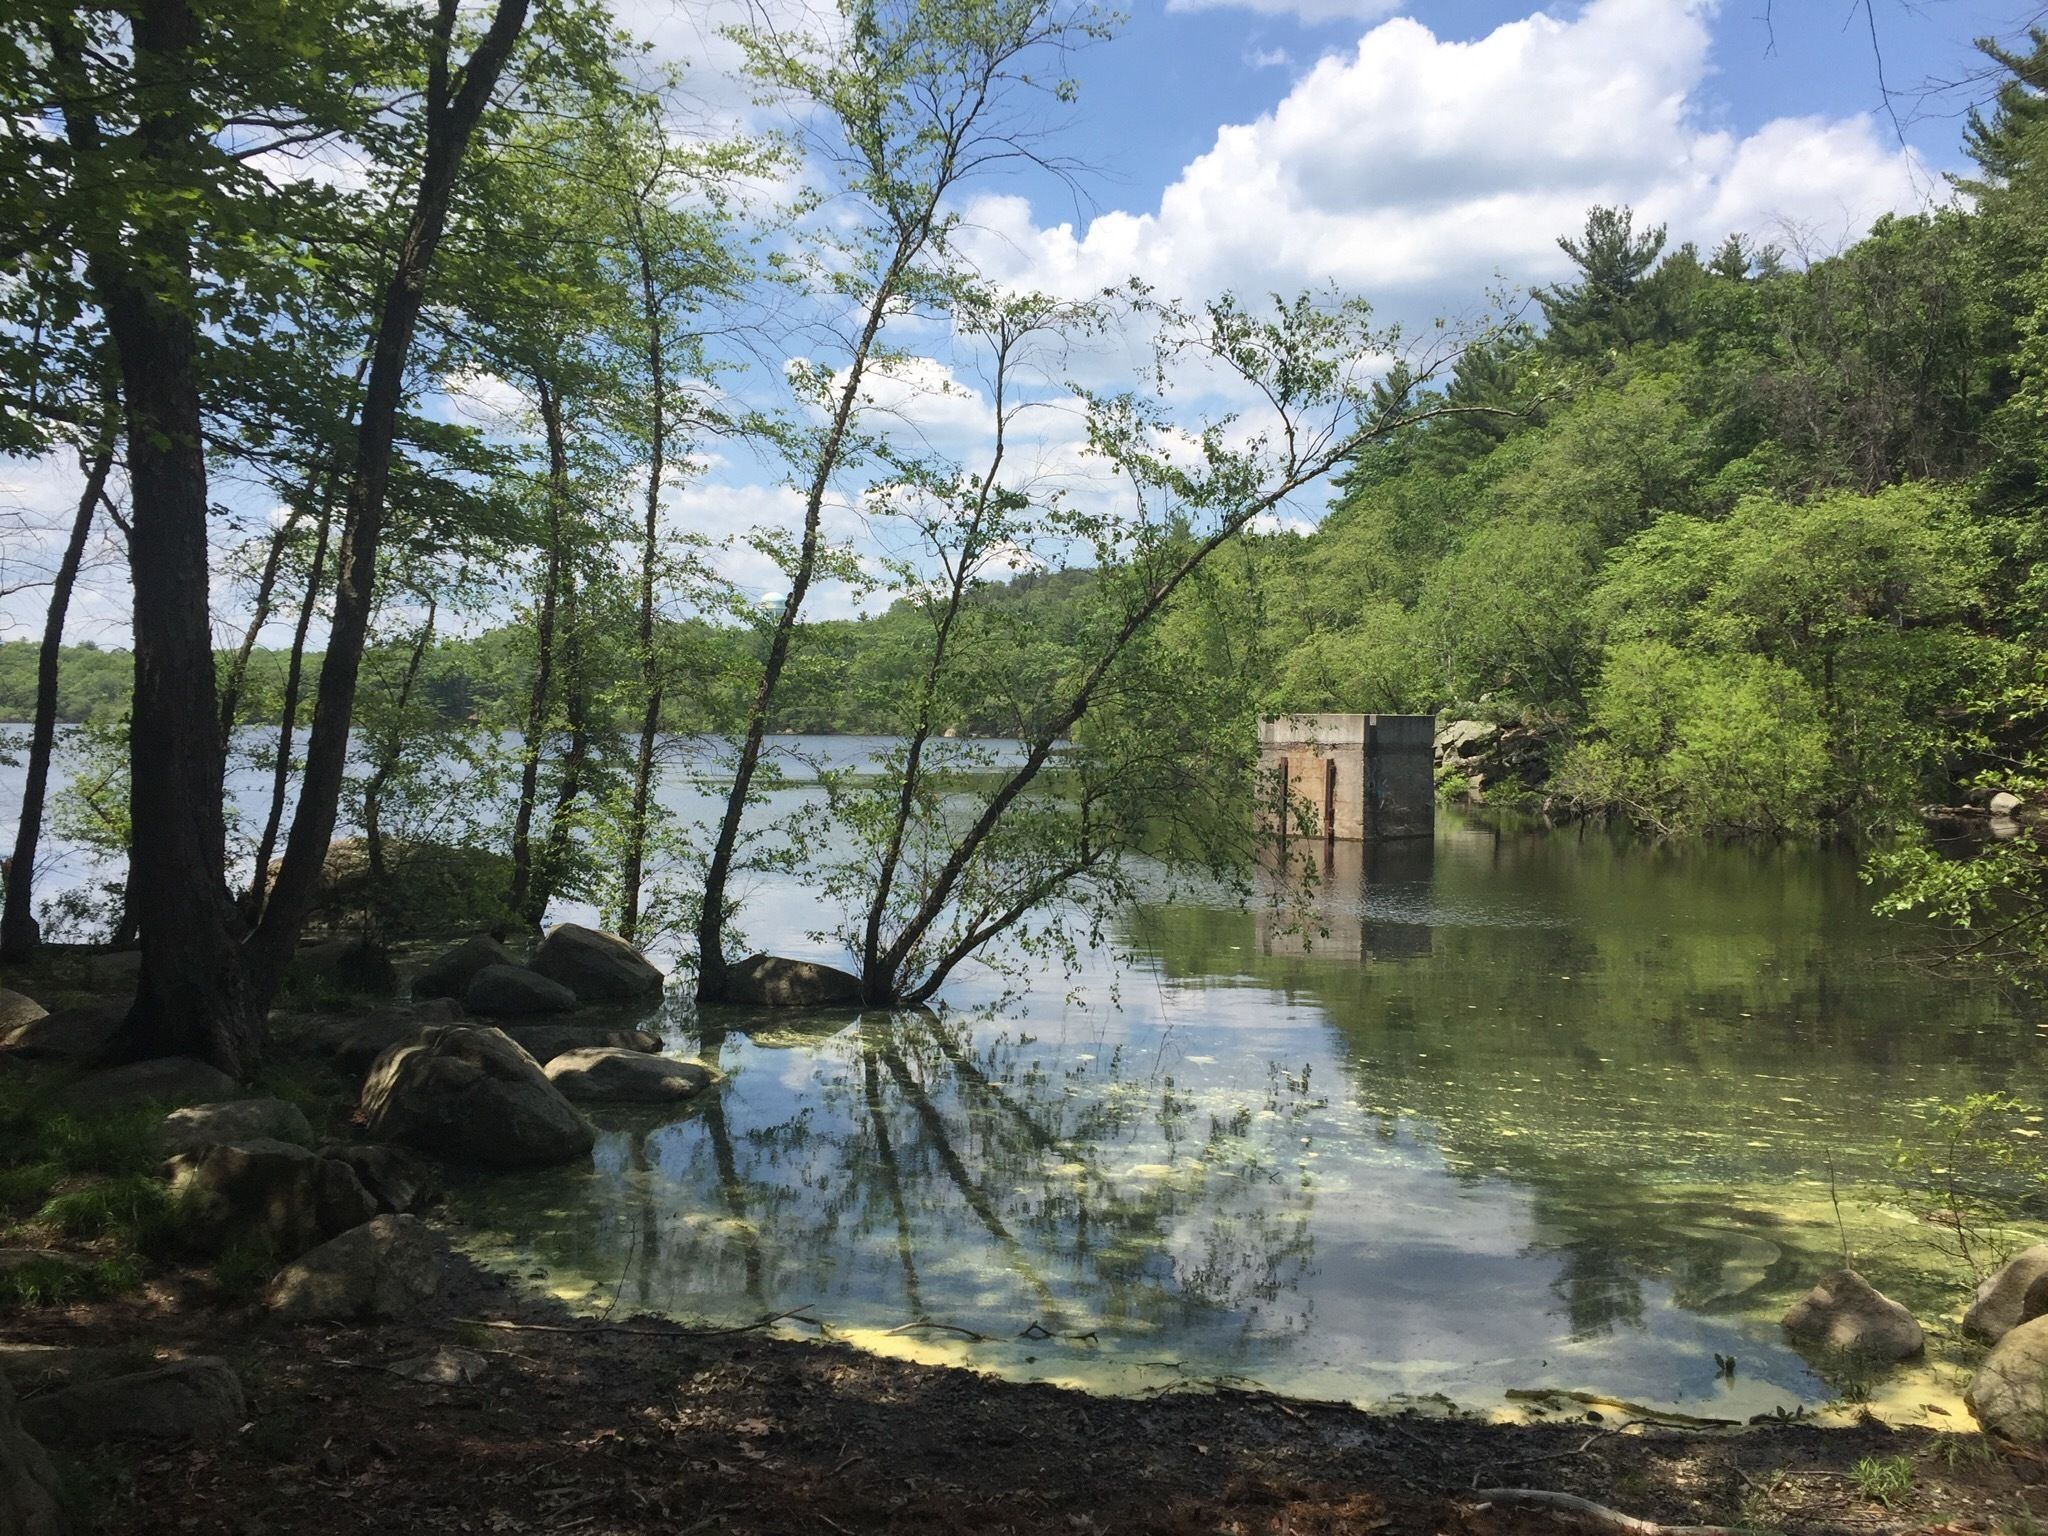 Trek Between Two Ponds On This Beautiful Loop Hike In Massachusetts' Lynn Woods Reservation